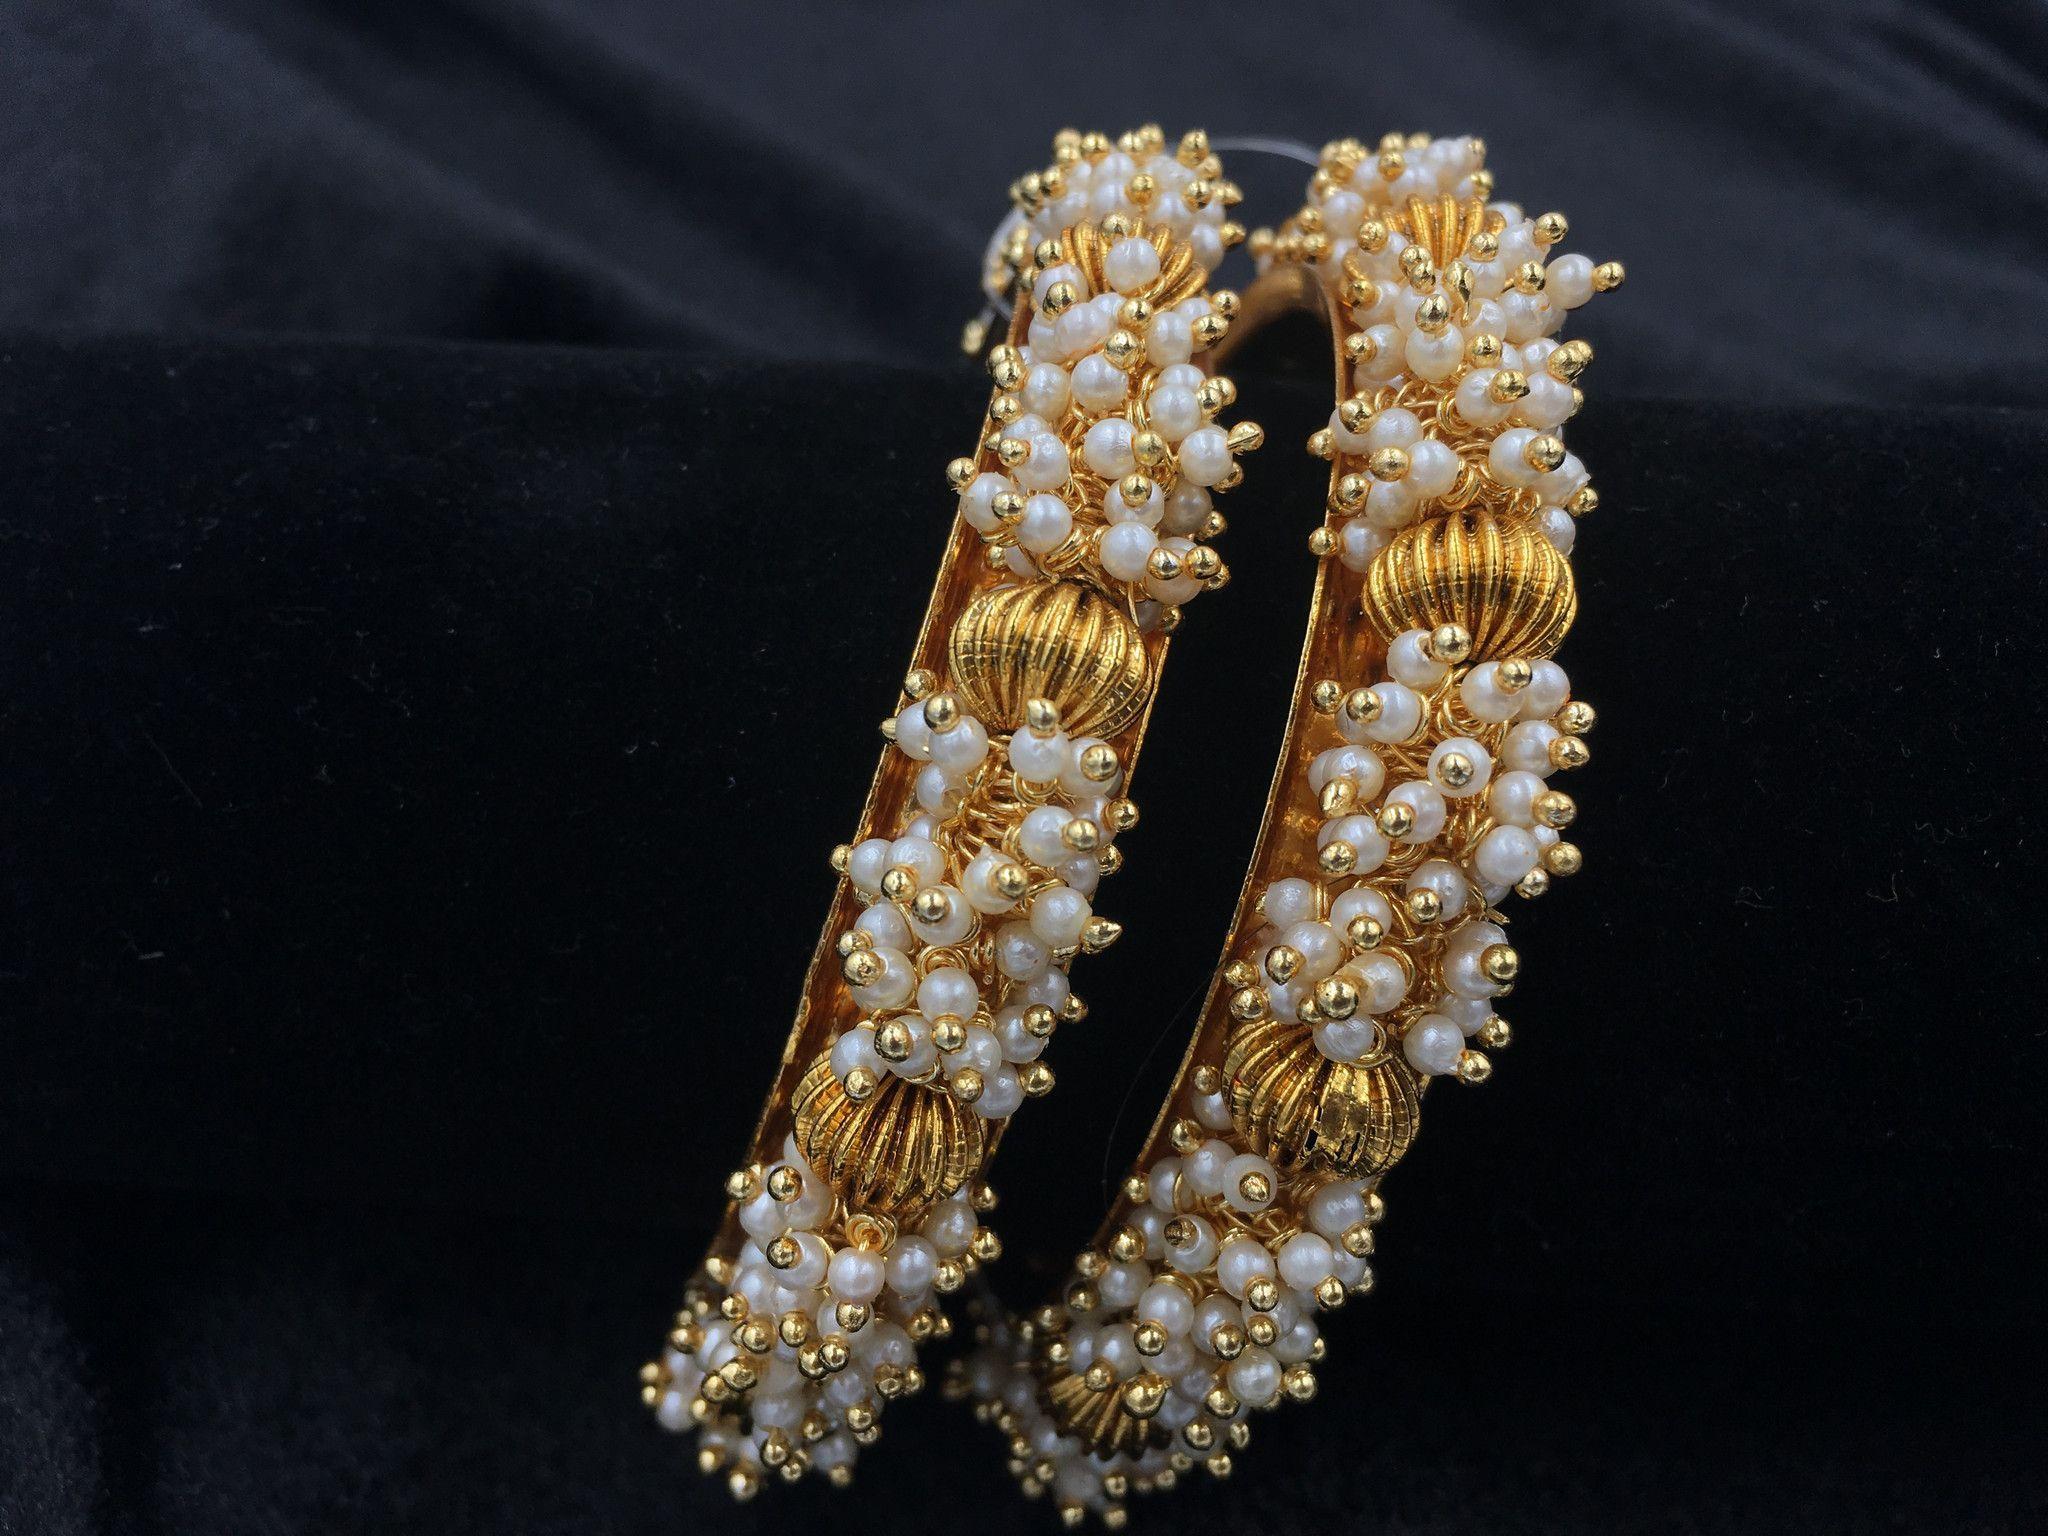 e72cf5d22ec Moti and golden balls bangles. Moti and golden balls bangles Available in  Sizes: 2-2 ...